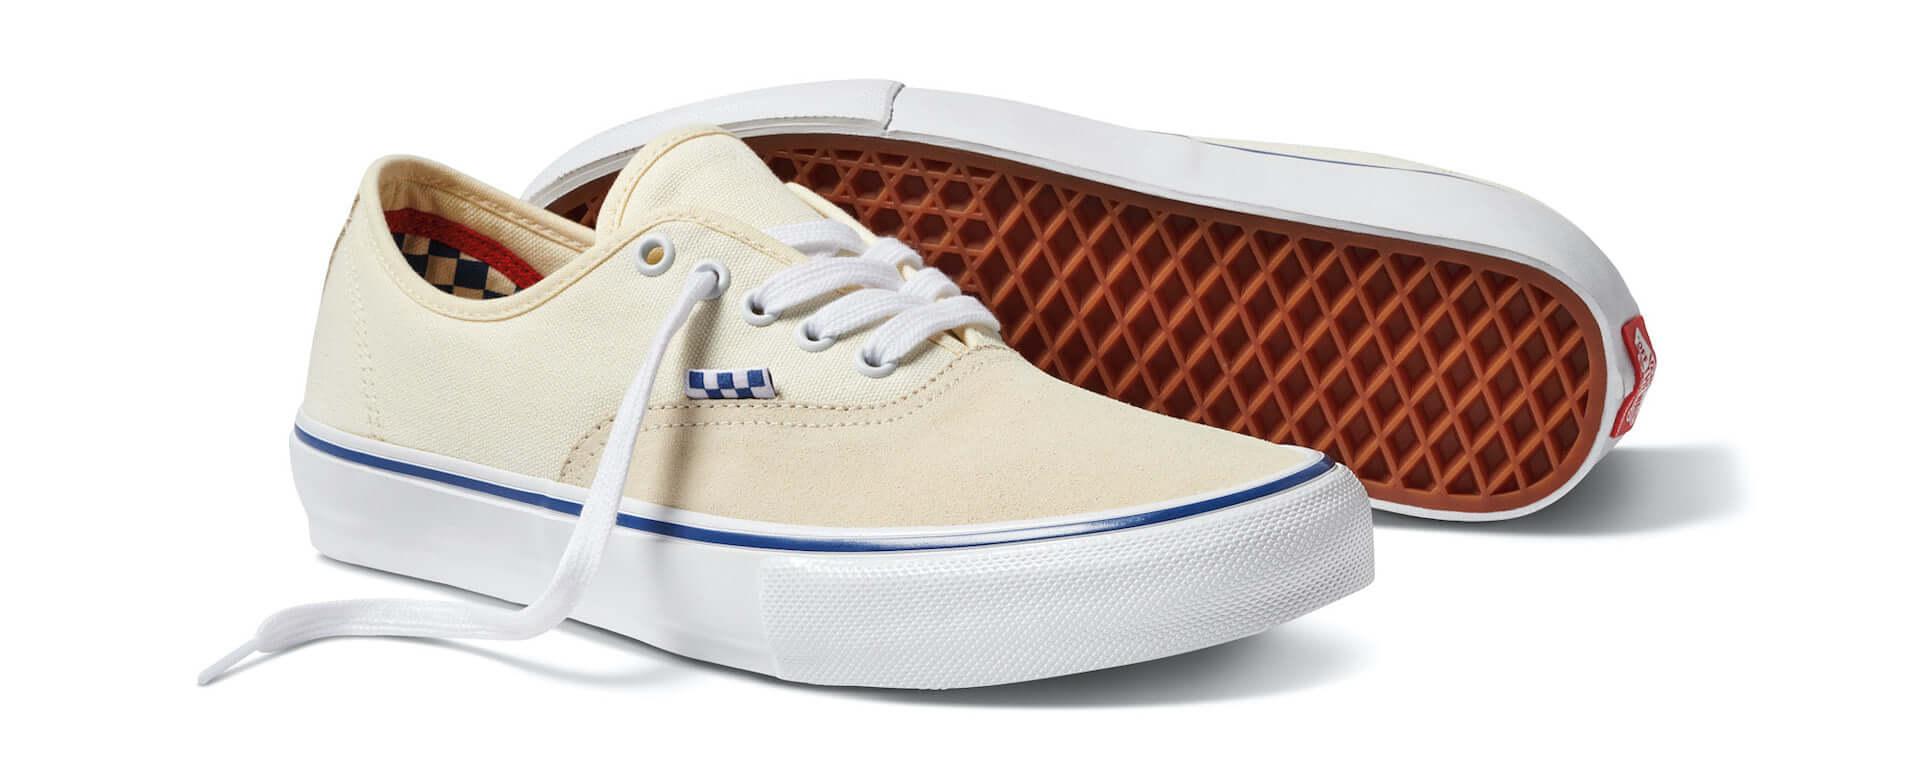 "VANSがスケーターに向けた新コレクション「Skate Classics」を発表!""全てが新しくなった""素材・構造に注目 lf210304_vans_16-1920x778"